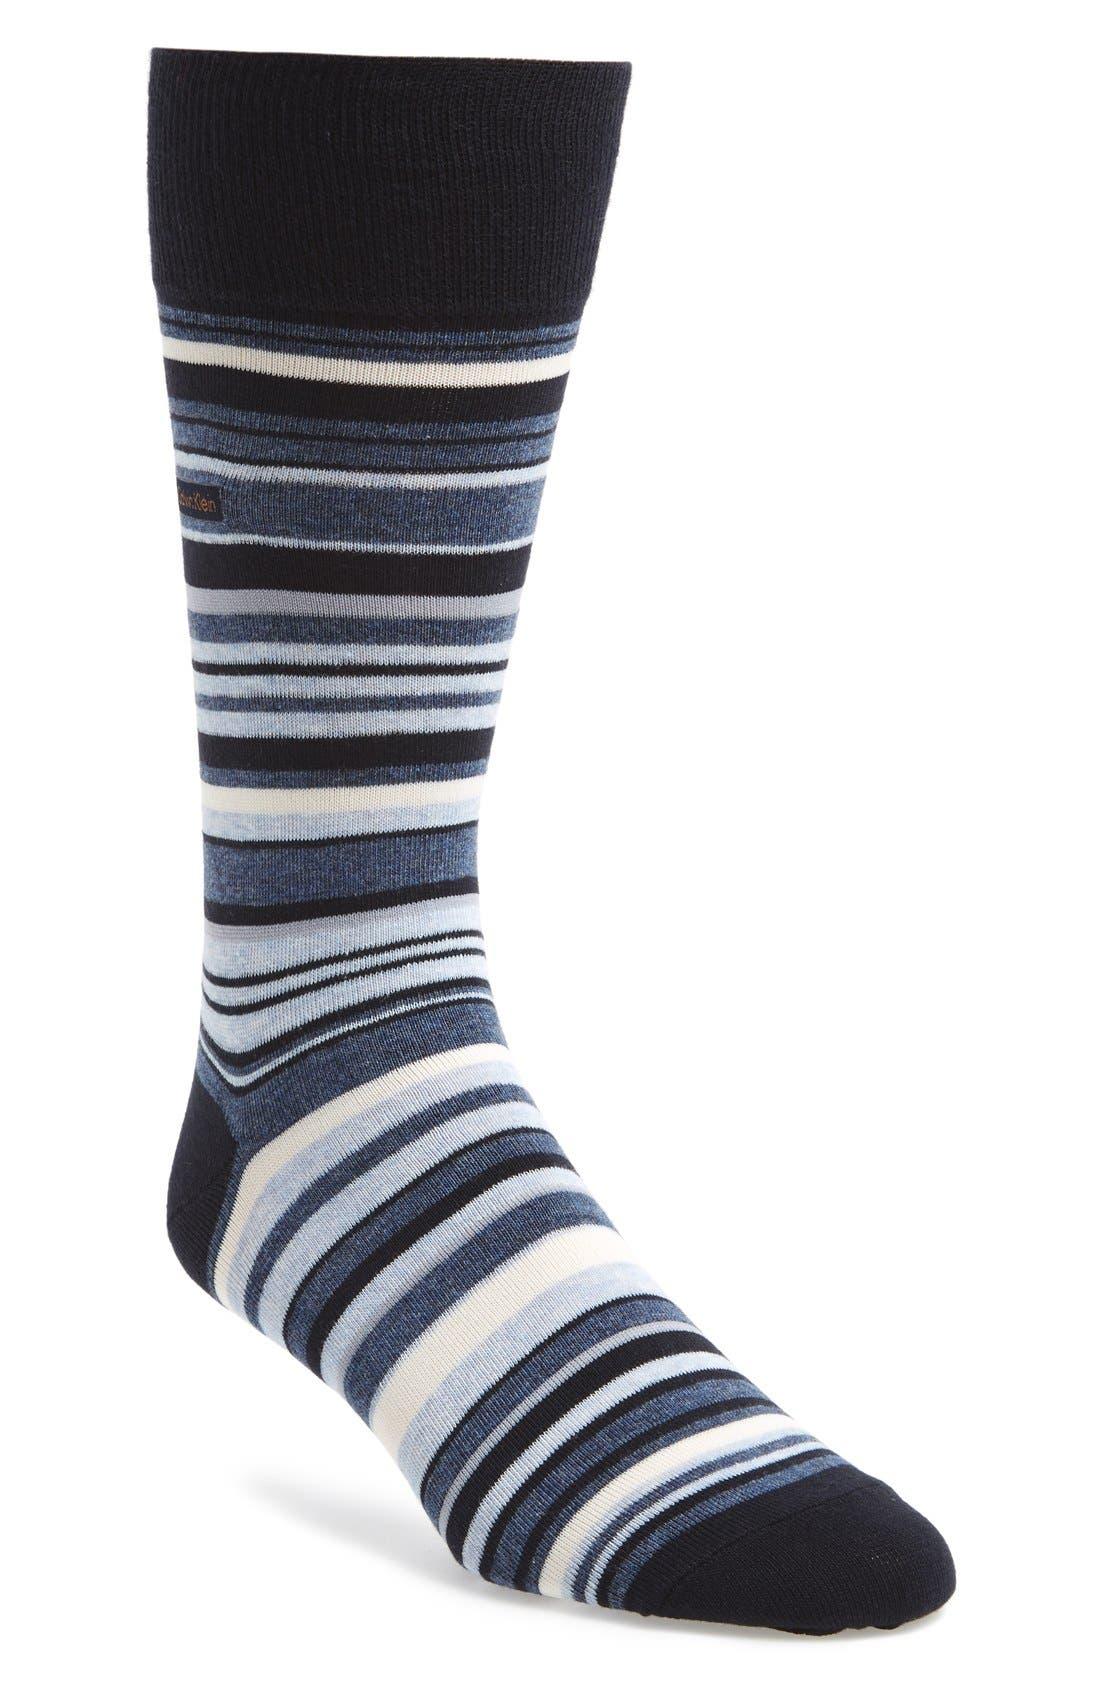 CALVIN KLEIN, Multistripe Emblem Socks, Main thumbnail 1, color, NAVY/ DENIM HEATHER